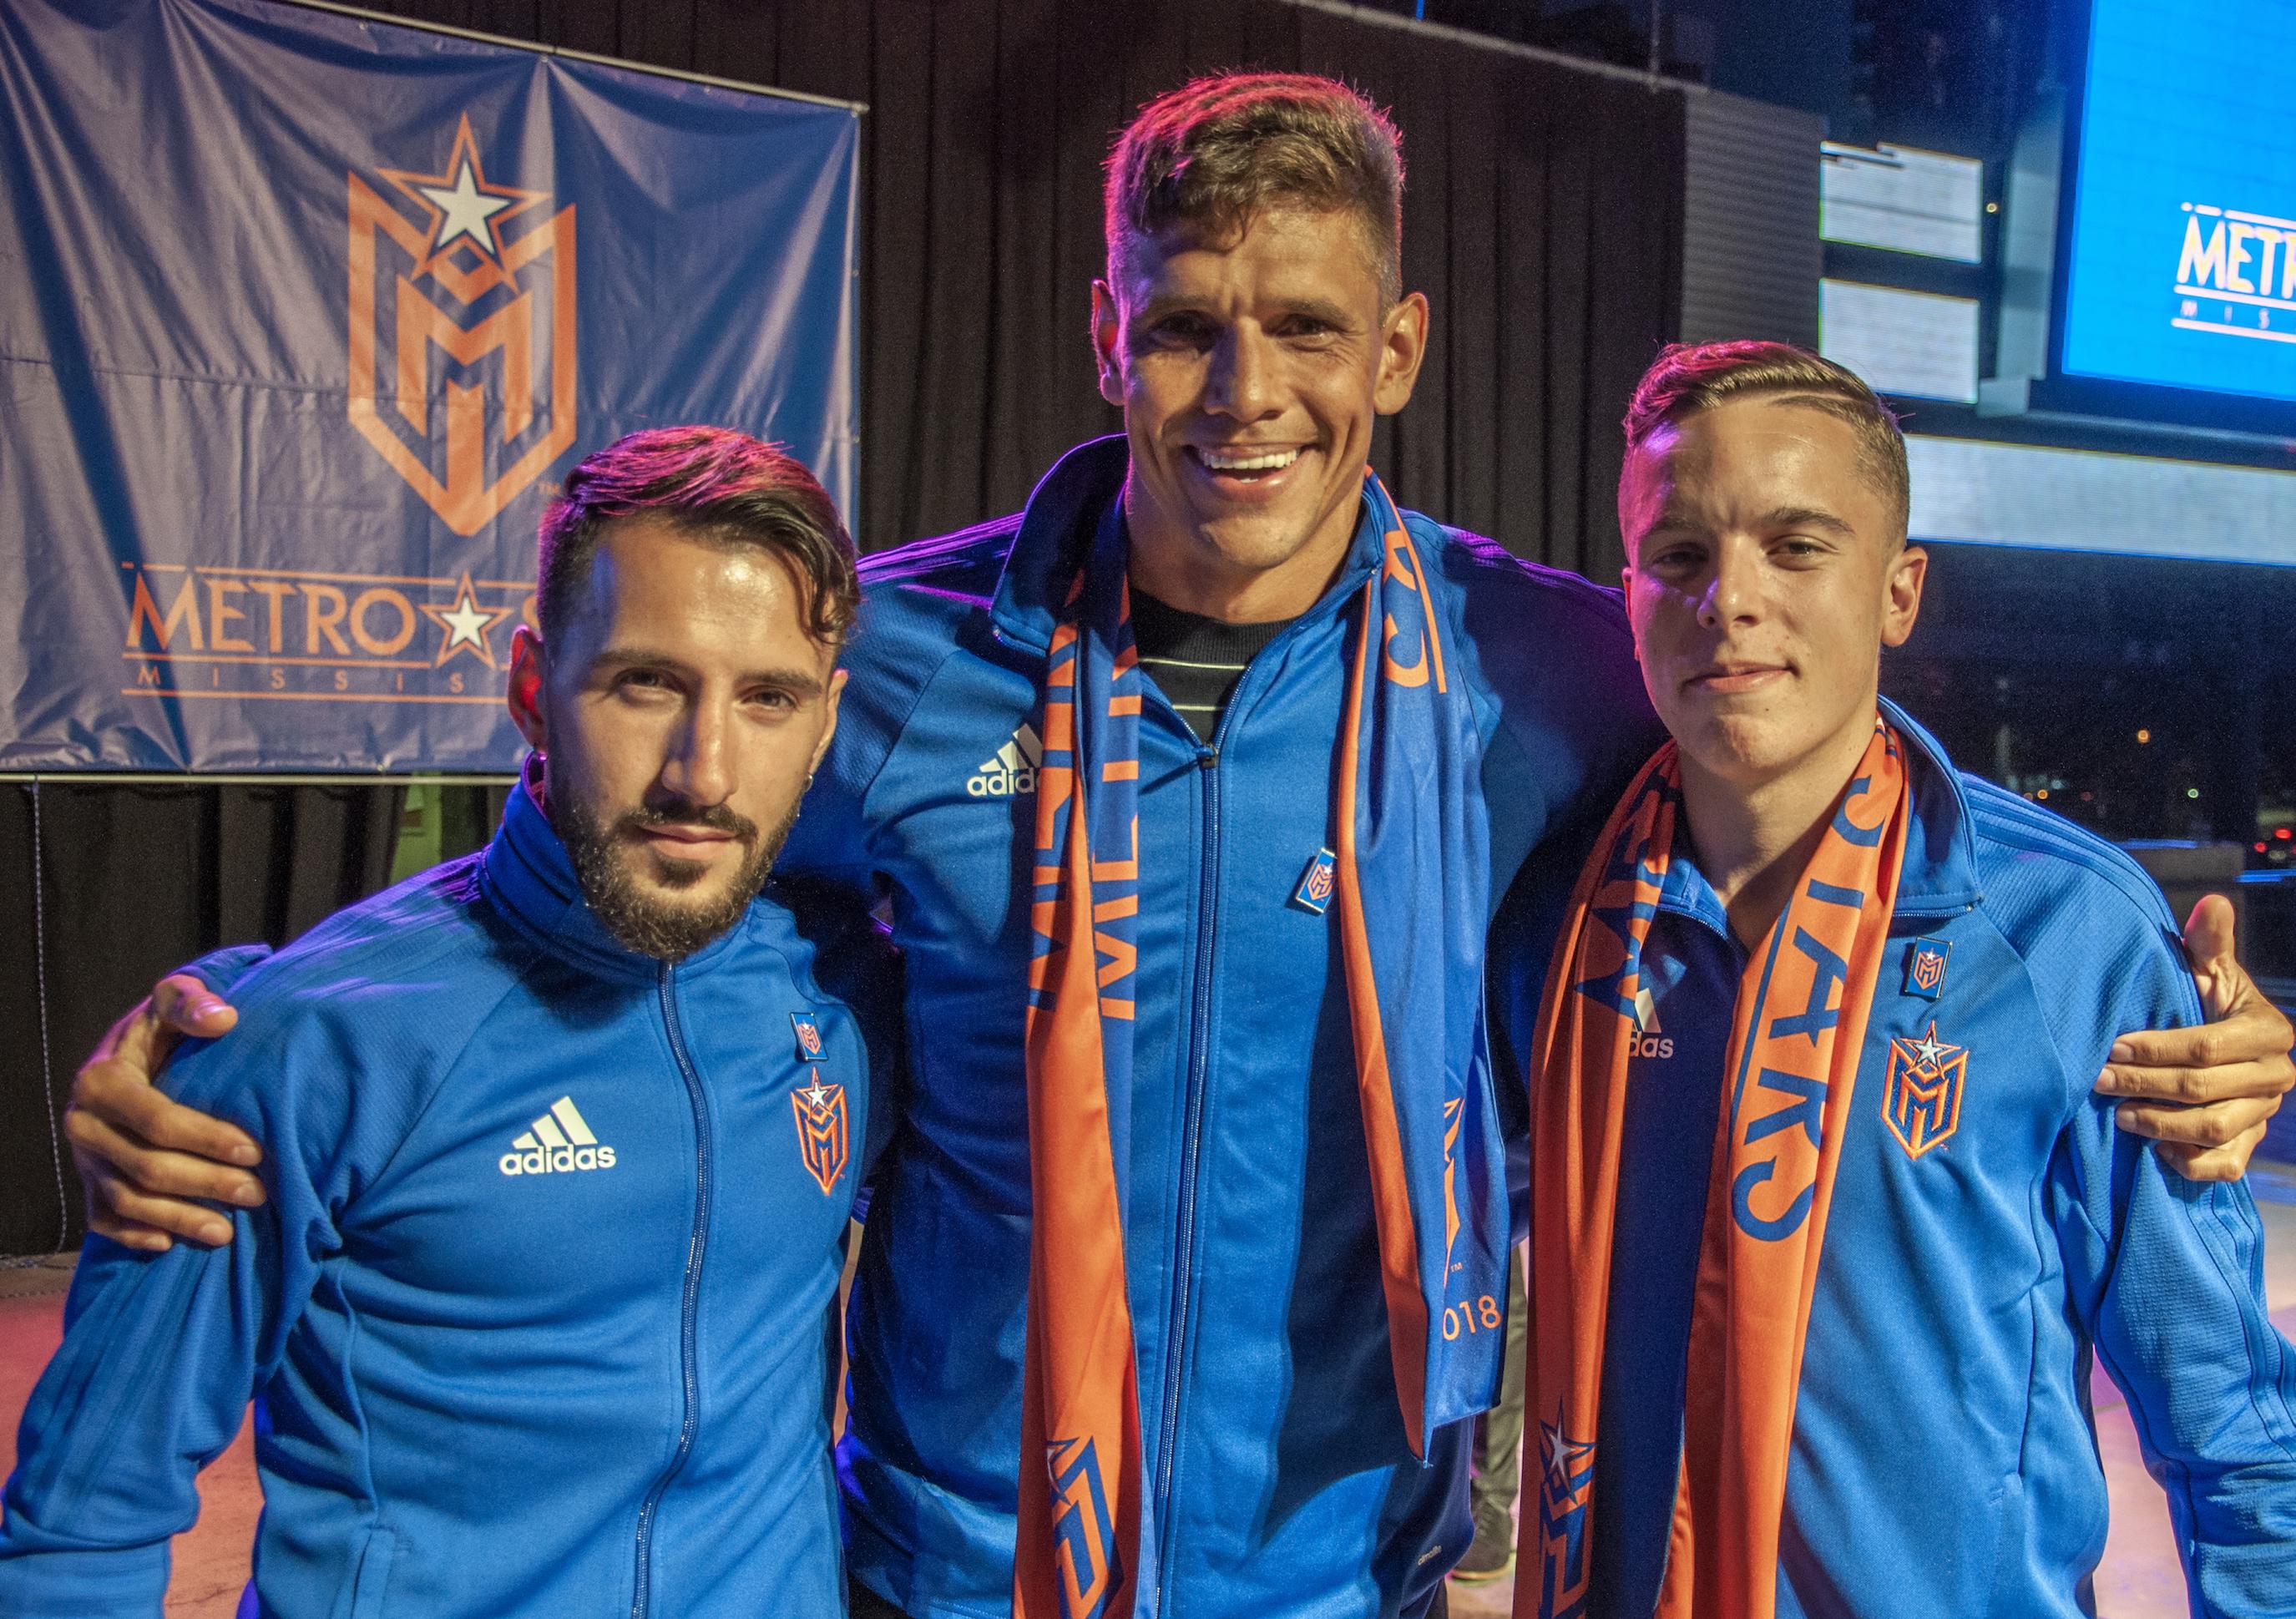 Mississauga MetroStars trio: Martinho Dumevski, Adrian Cann, and Luis Rocha